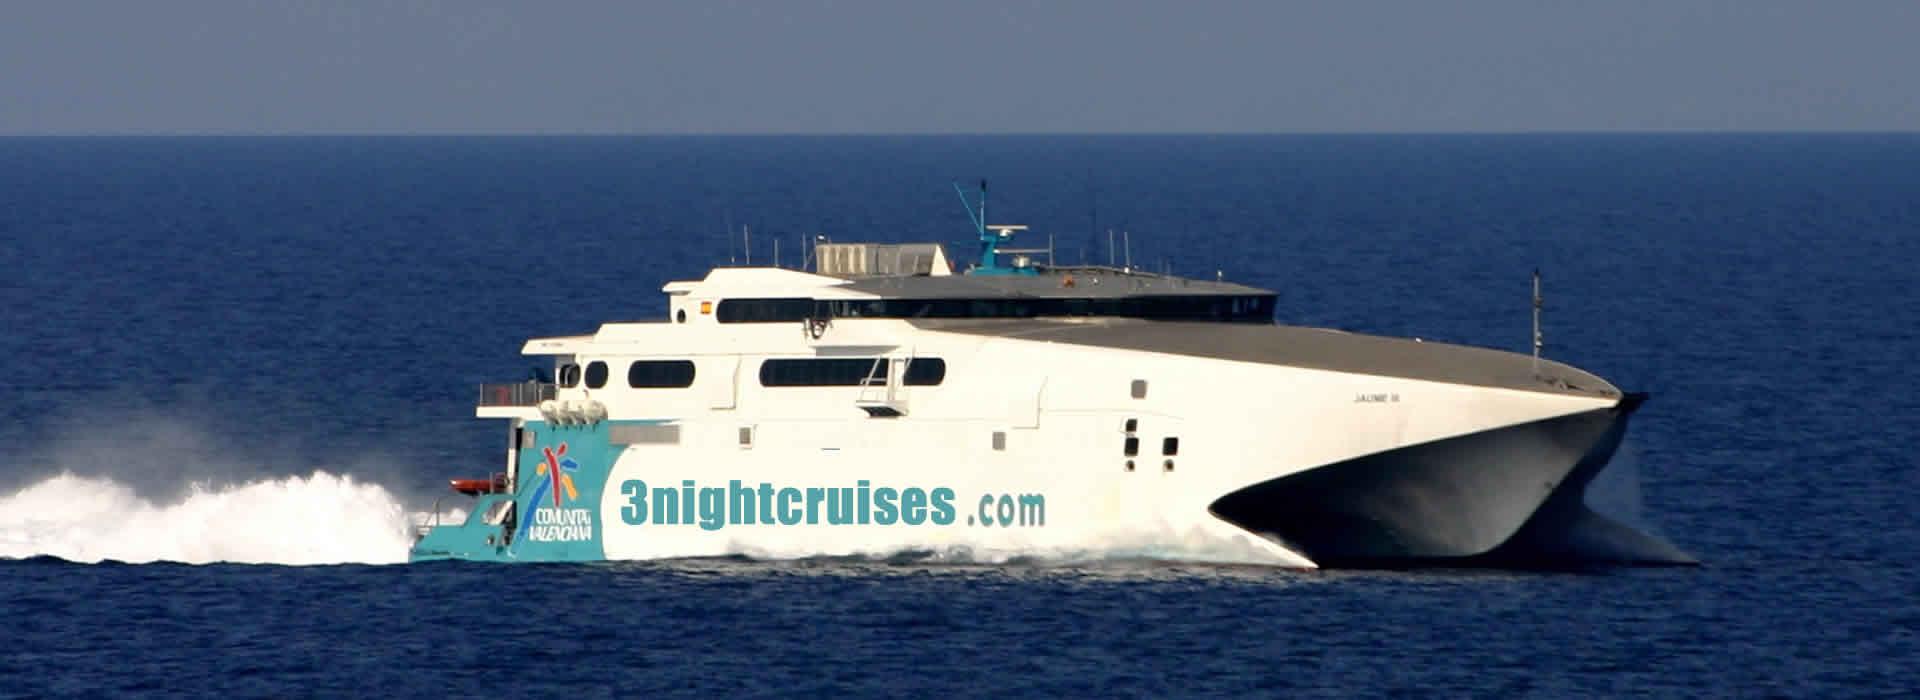 http://thegrandbahamas.com/wp-content/uploads/2016/07/3-night-cruise-grand-bahamas.jpg